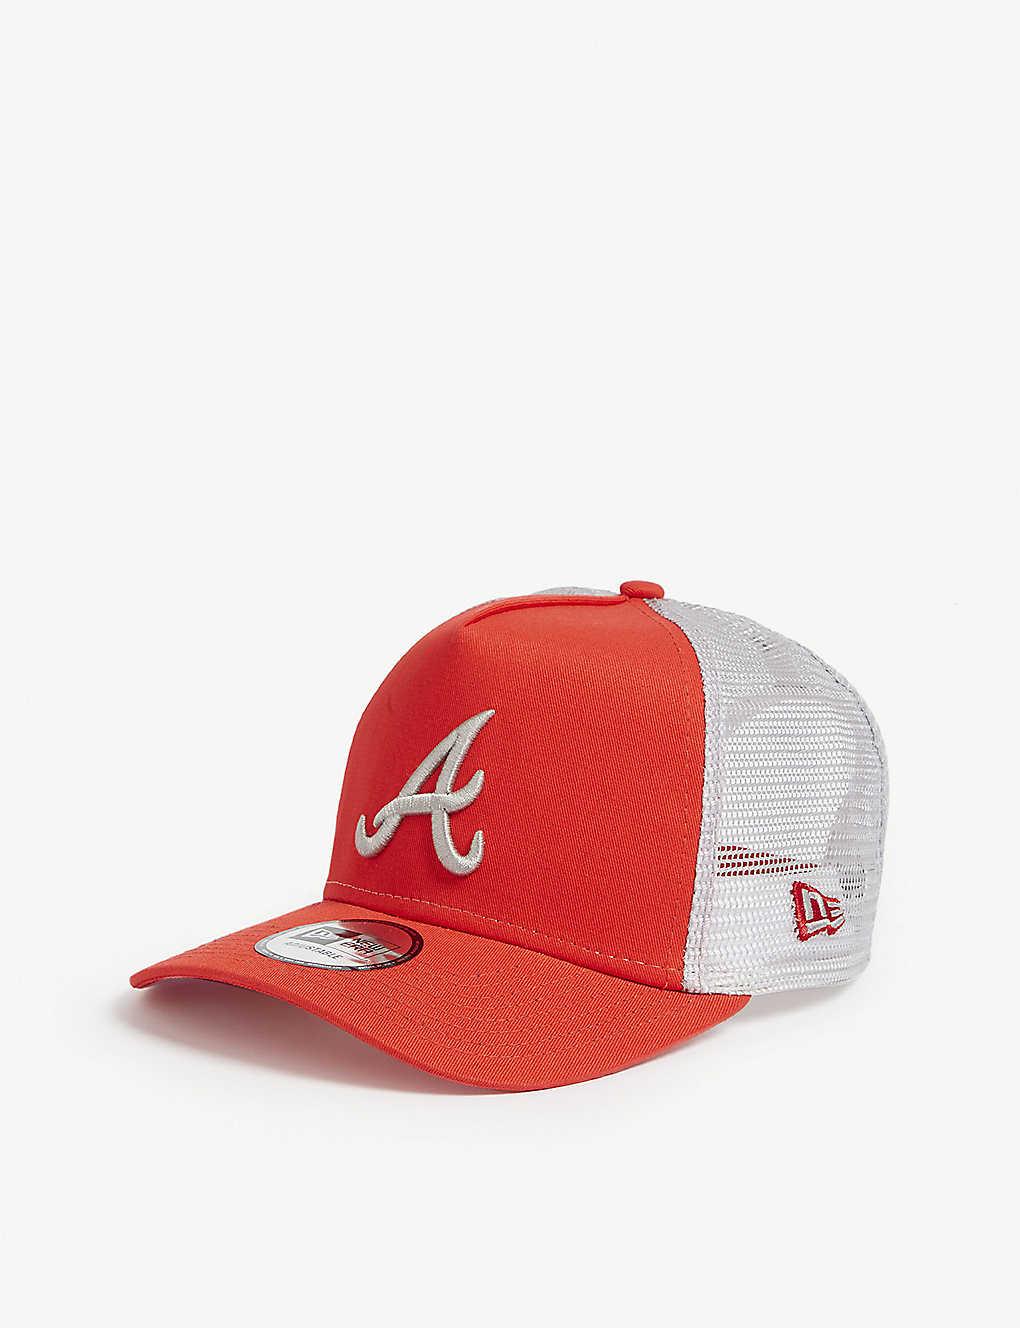 newest 7fd1a 79136 ... Atlanta Braves mesh snapback cap - Hot red grey ...